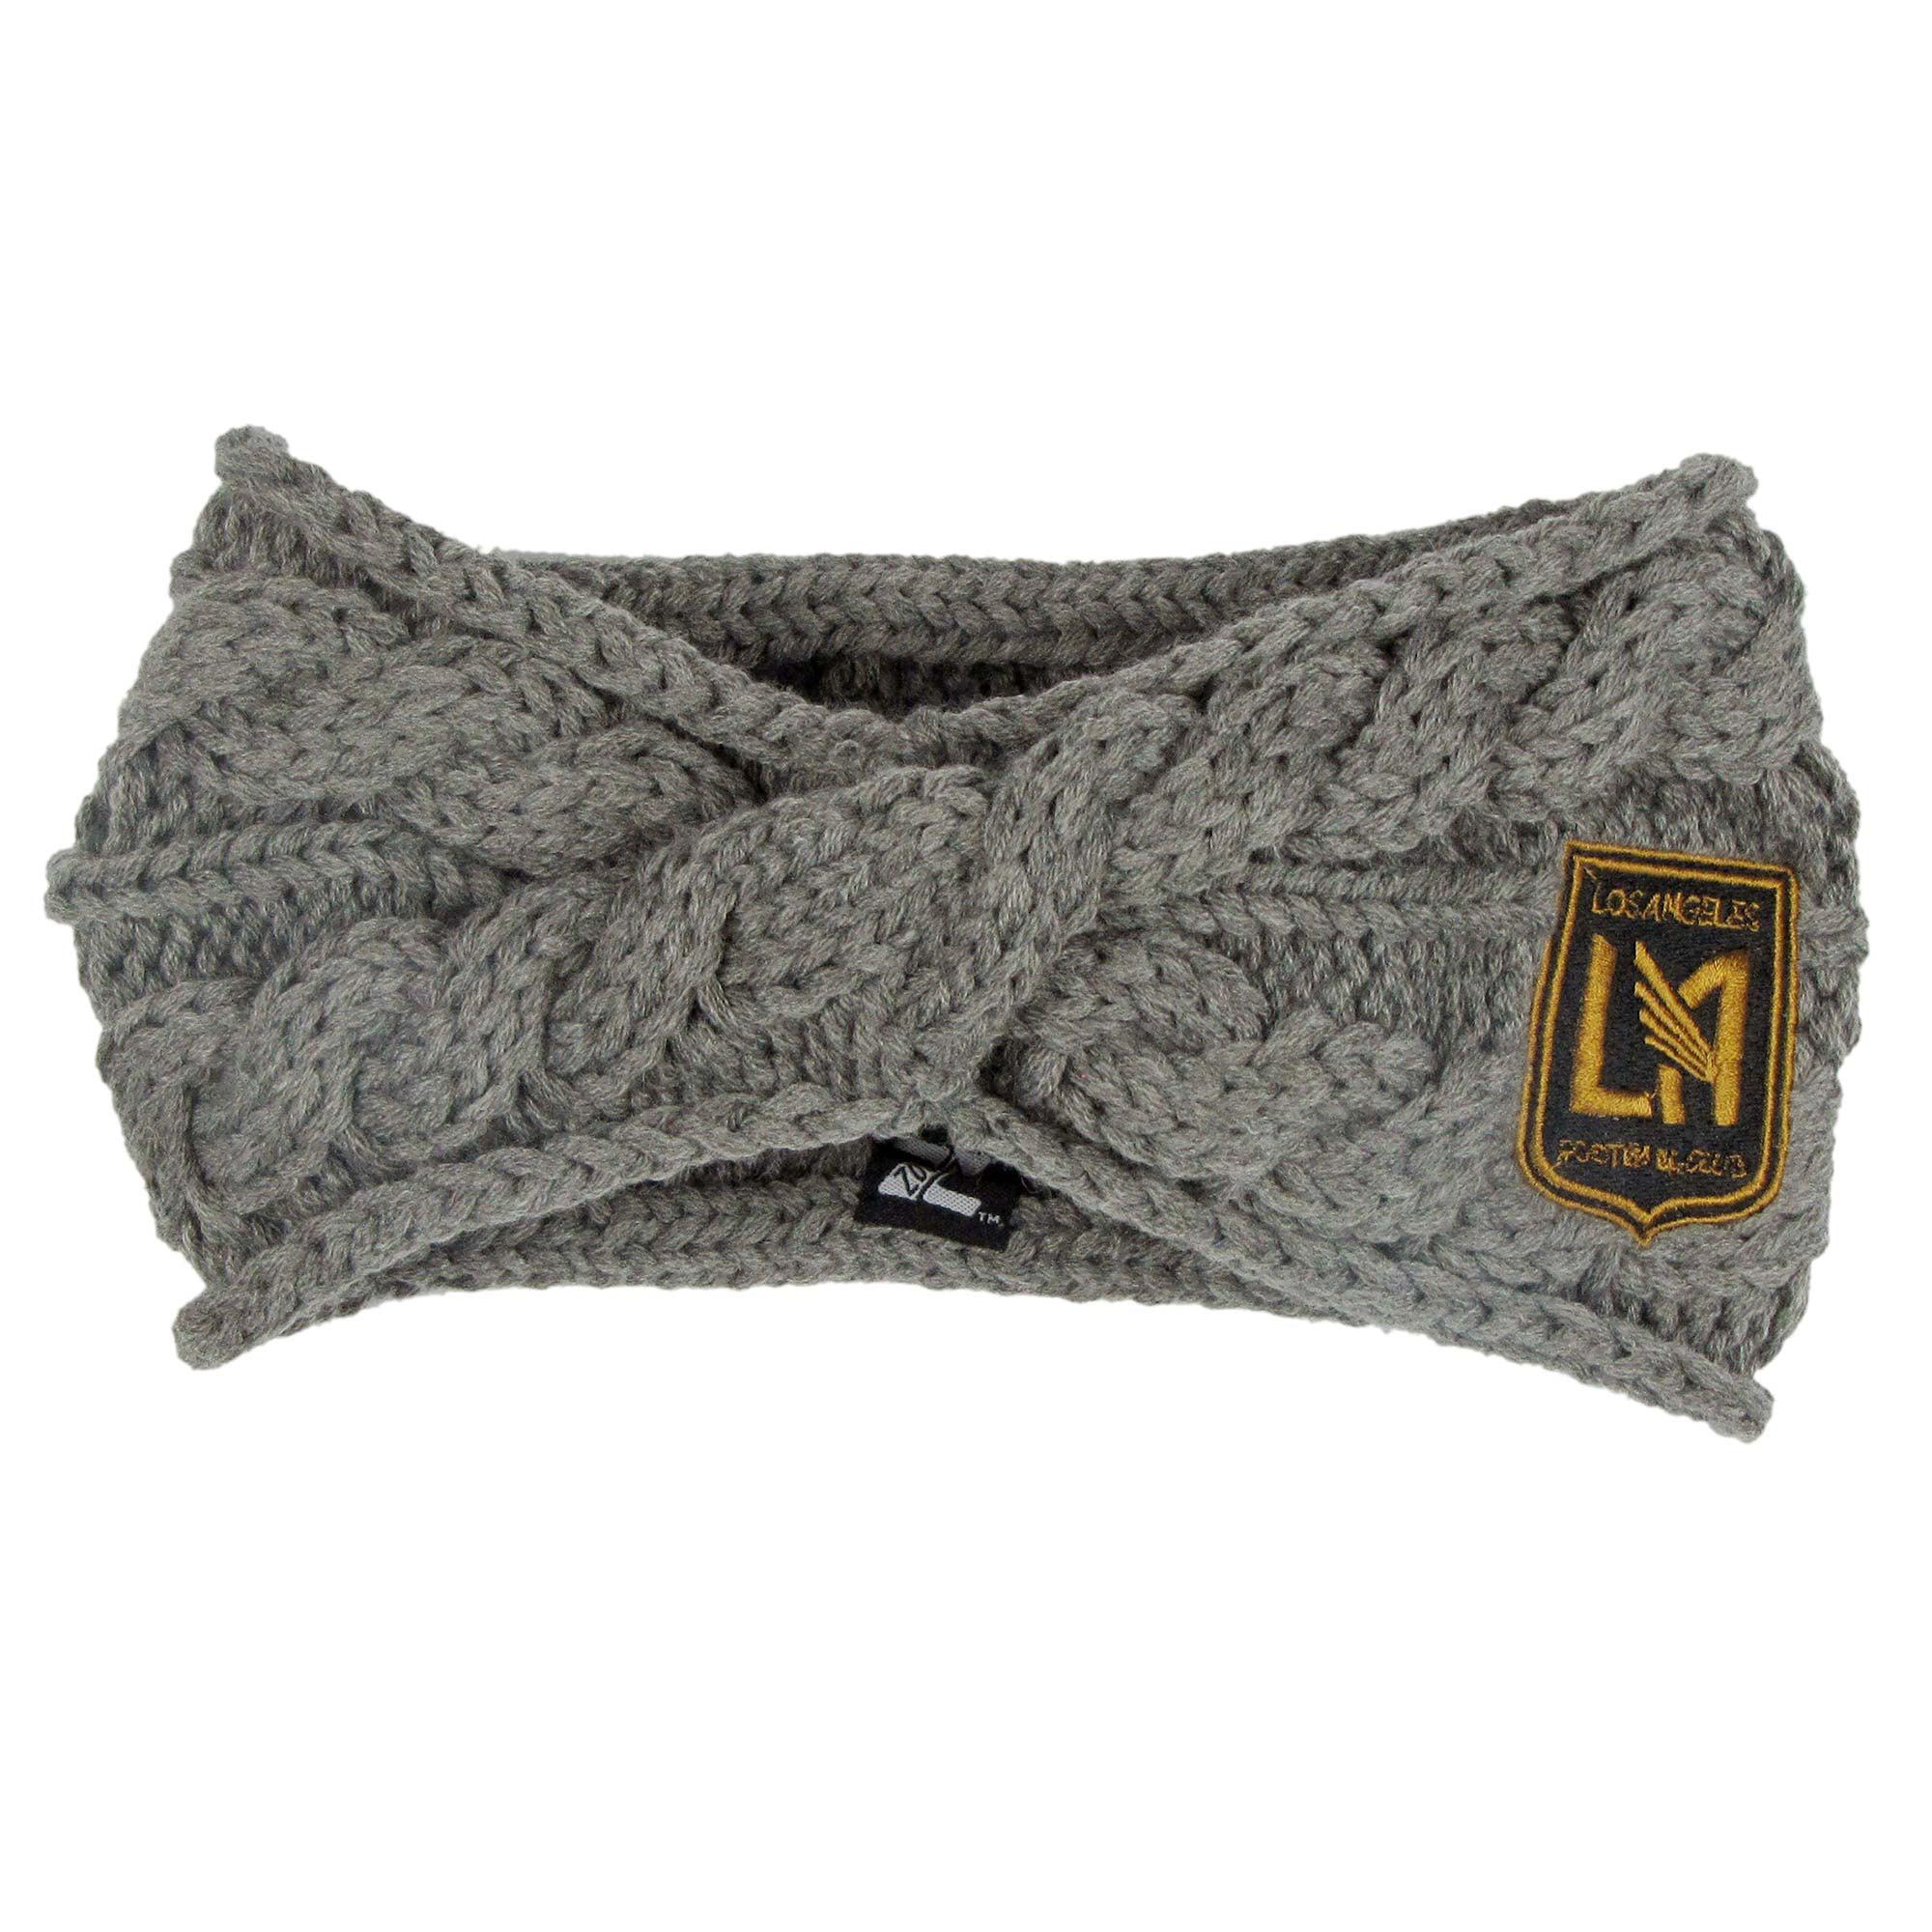 LAFC ZooZatz Women's Cable Headband - Charcoal - No Size